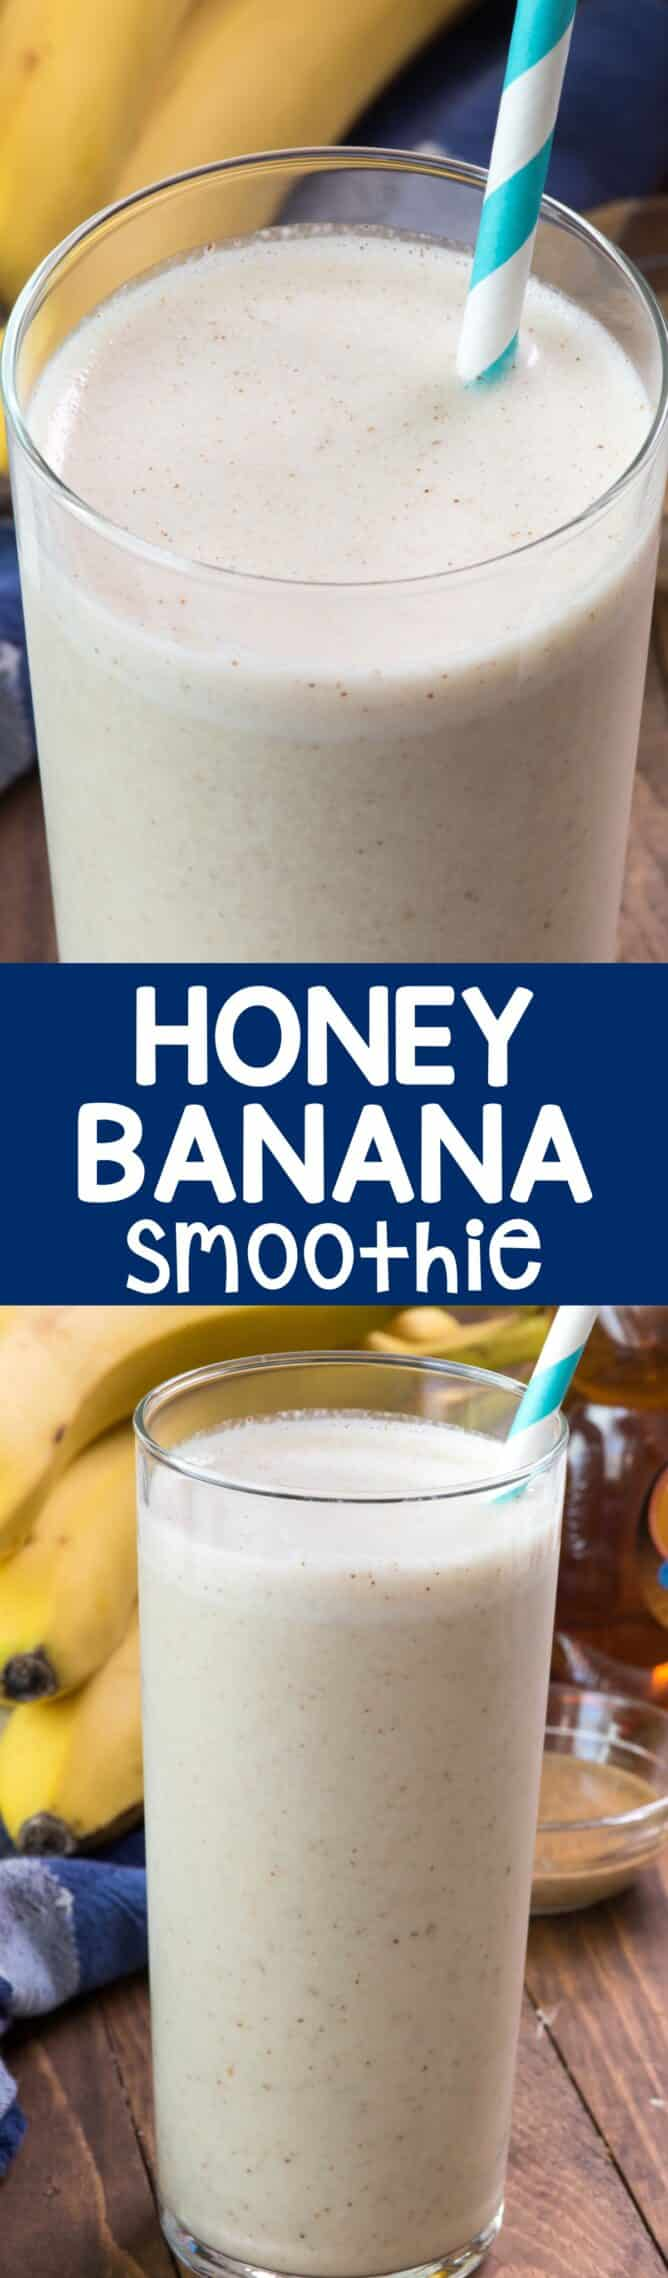 Honey Banana Smoothie collage photo